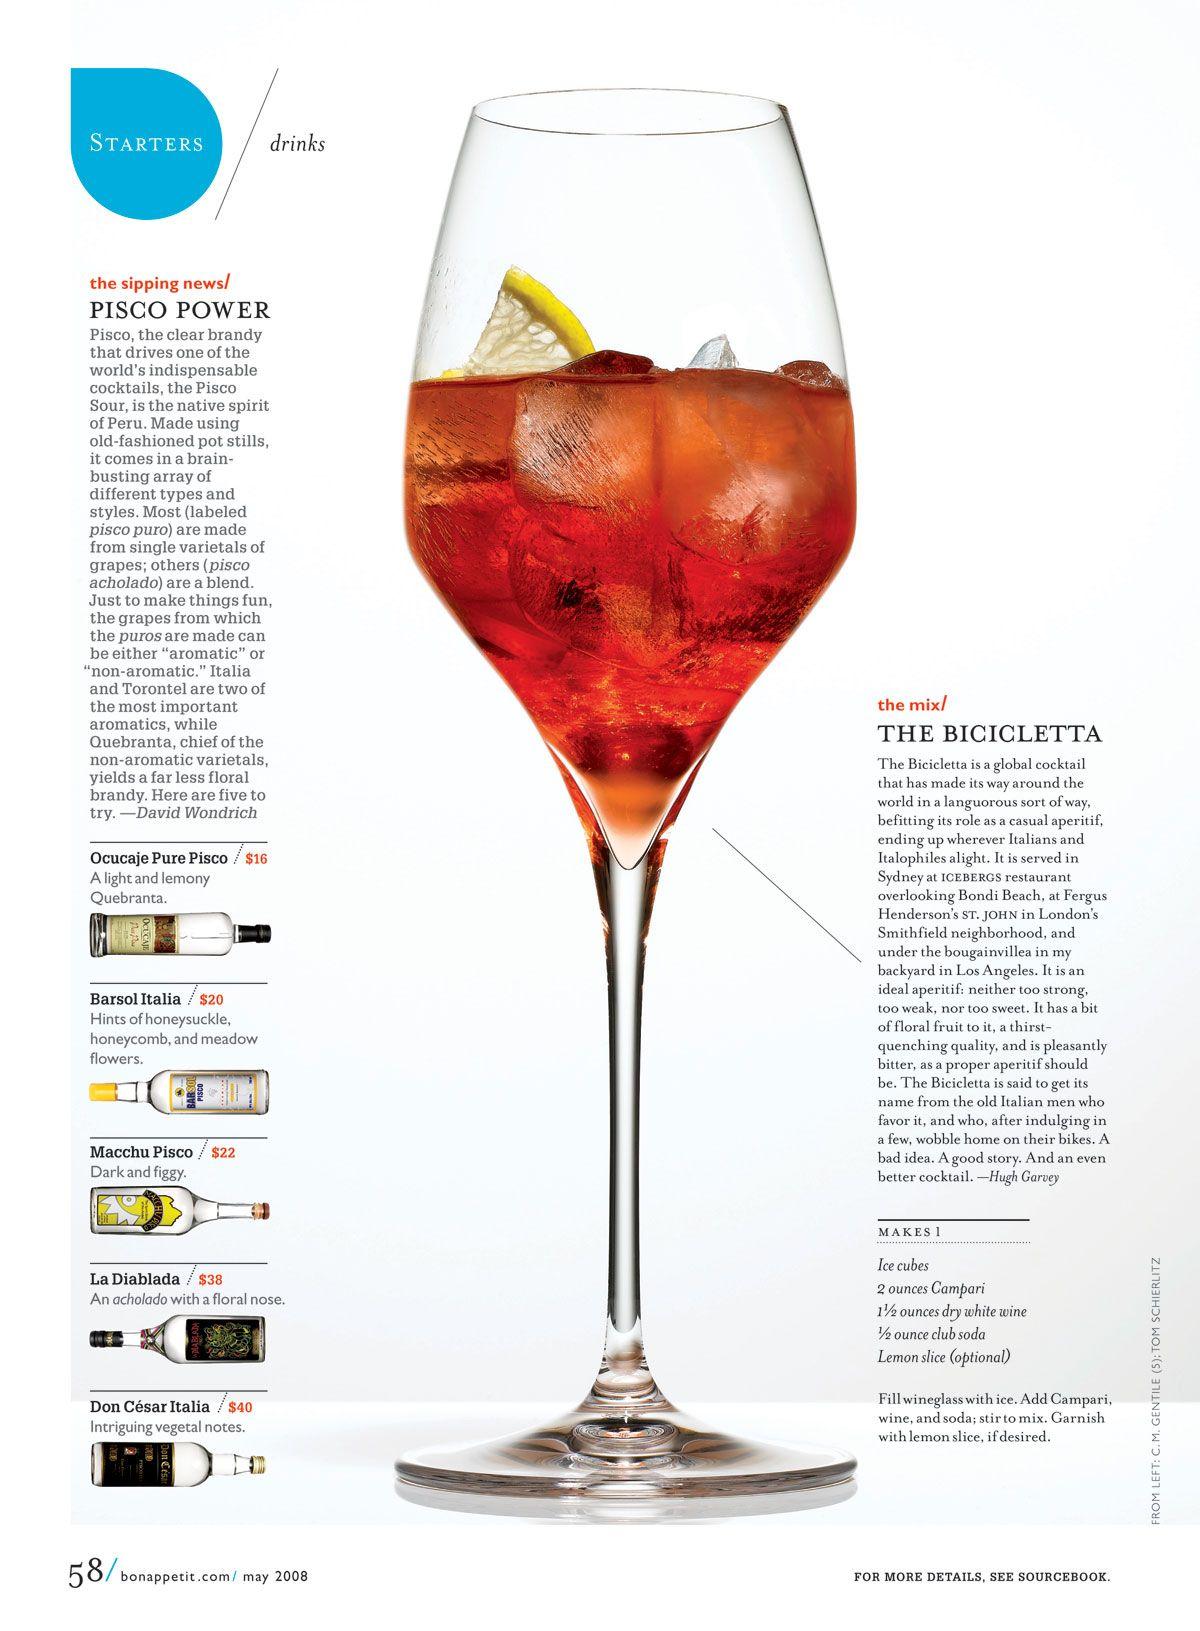 B3032889078d0c72283487333c74aaf0 Jpg 1200 1631 Magazine Layout Design Wine Design Wellness Design